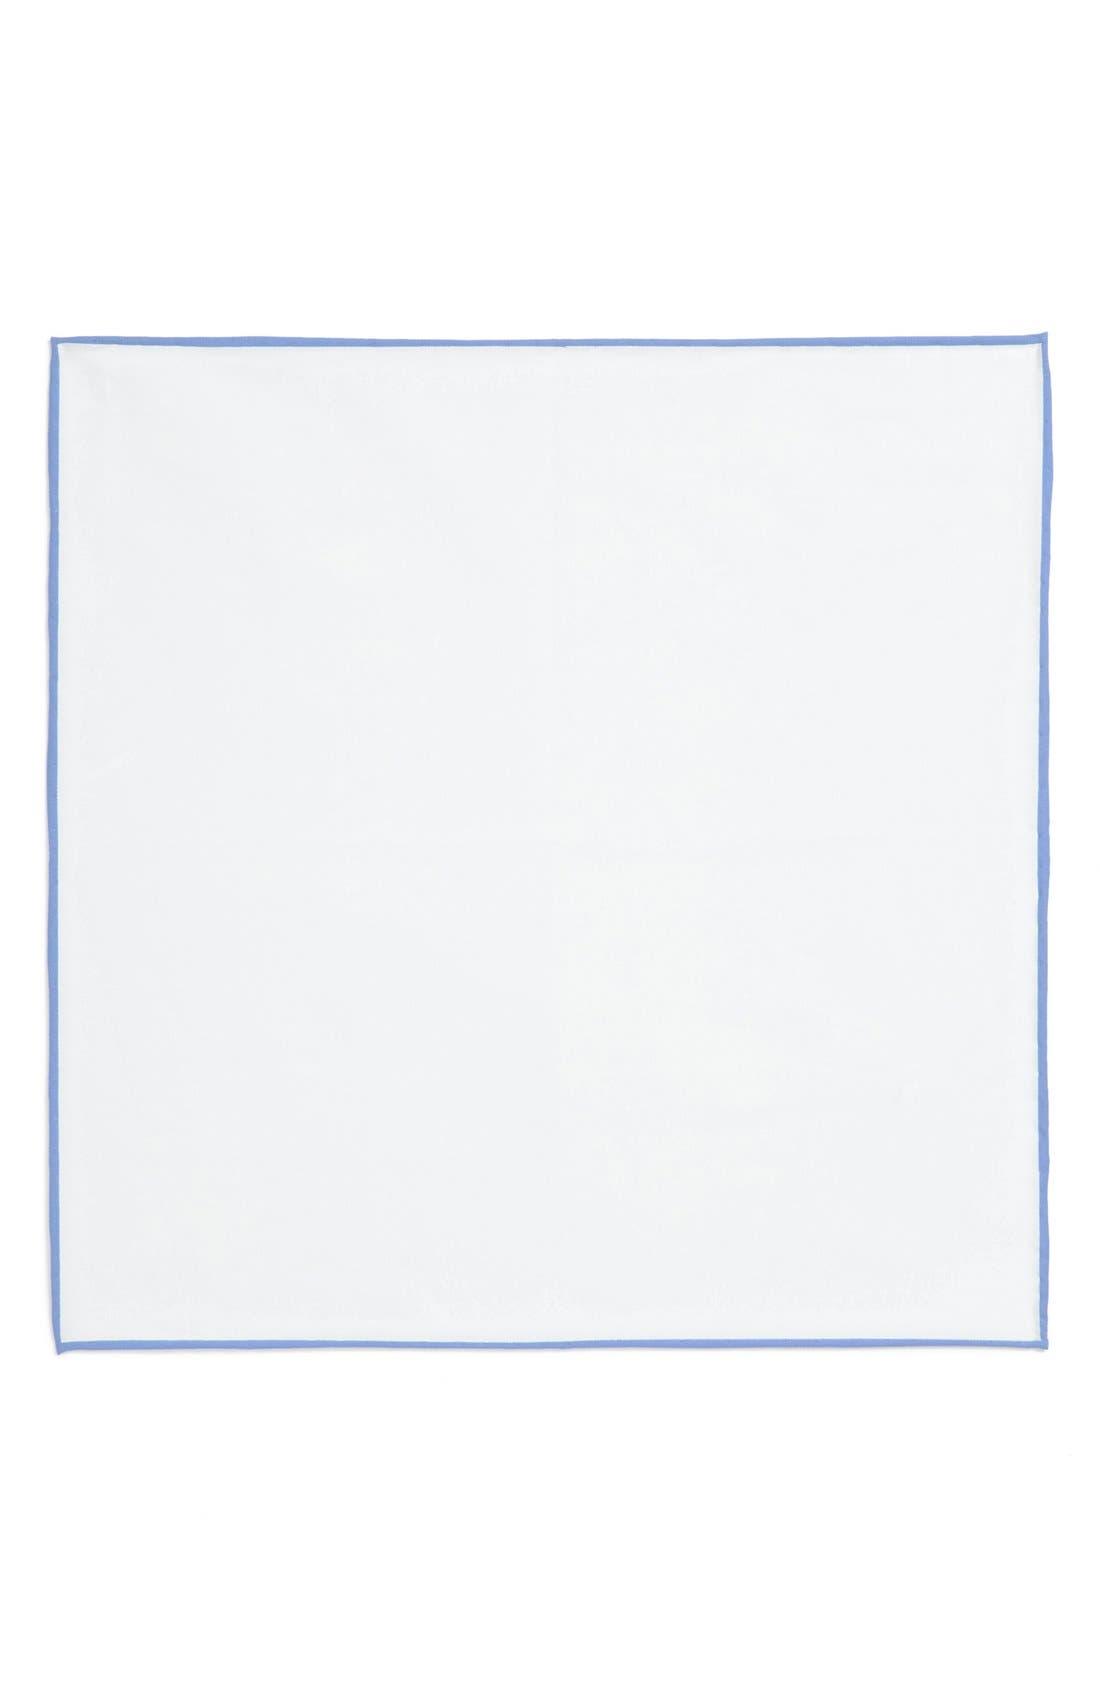 Cotton Solid Pocket Square,                             Alternate thumbnail 3, color,                             White/ Light Blue